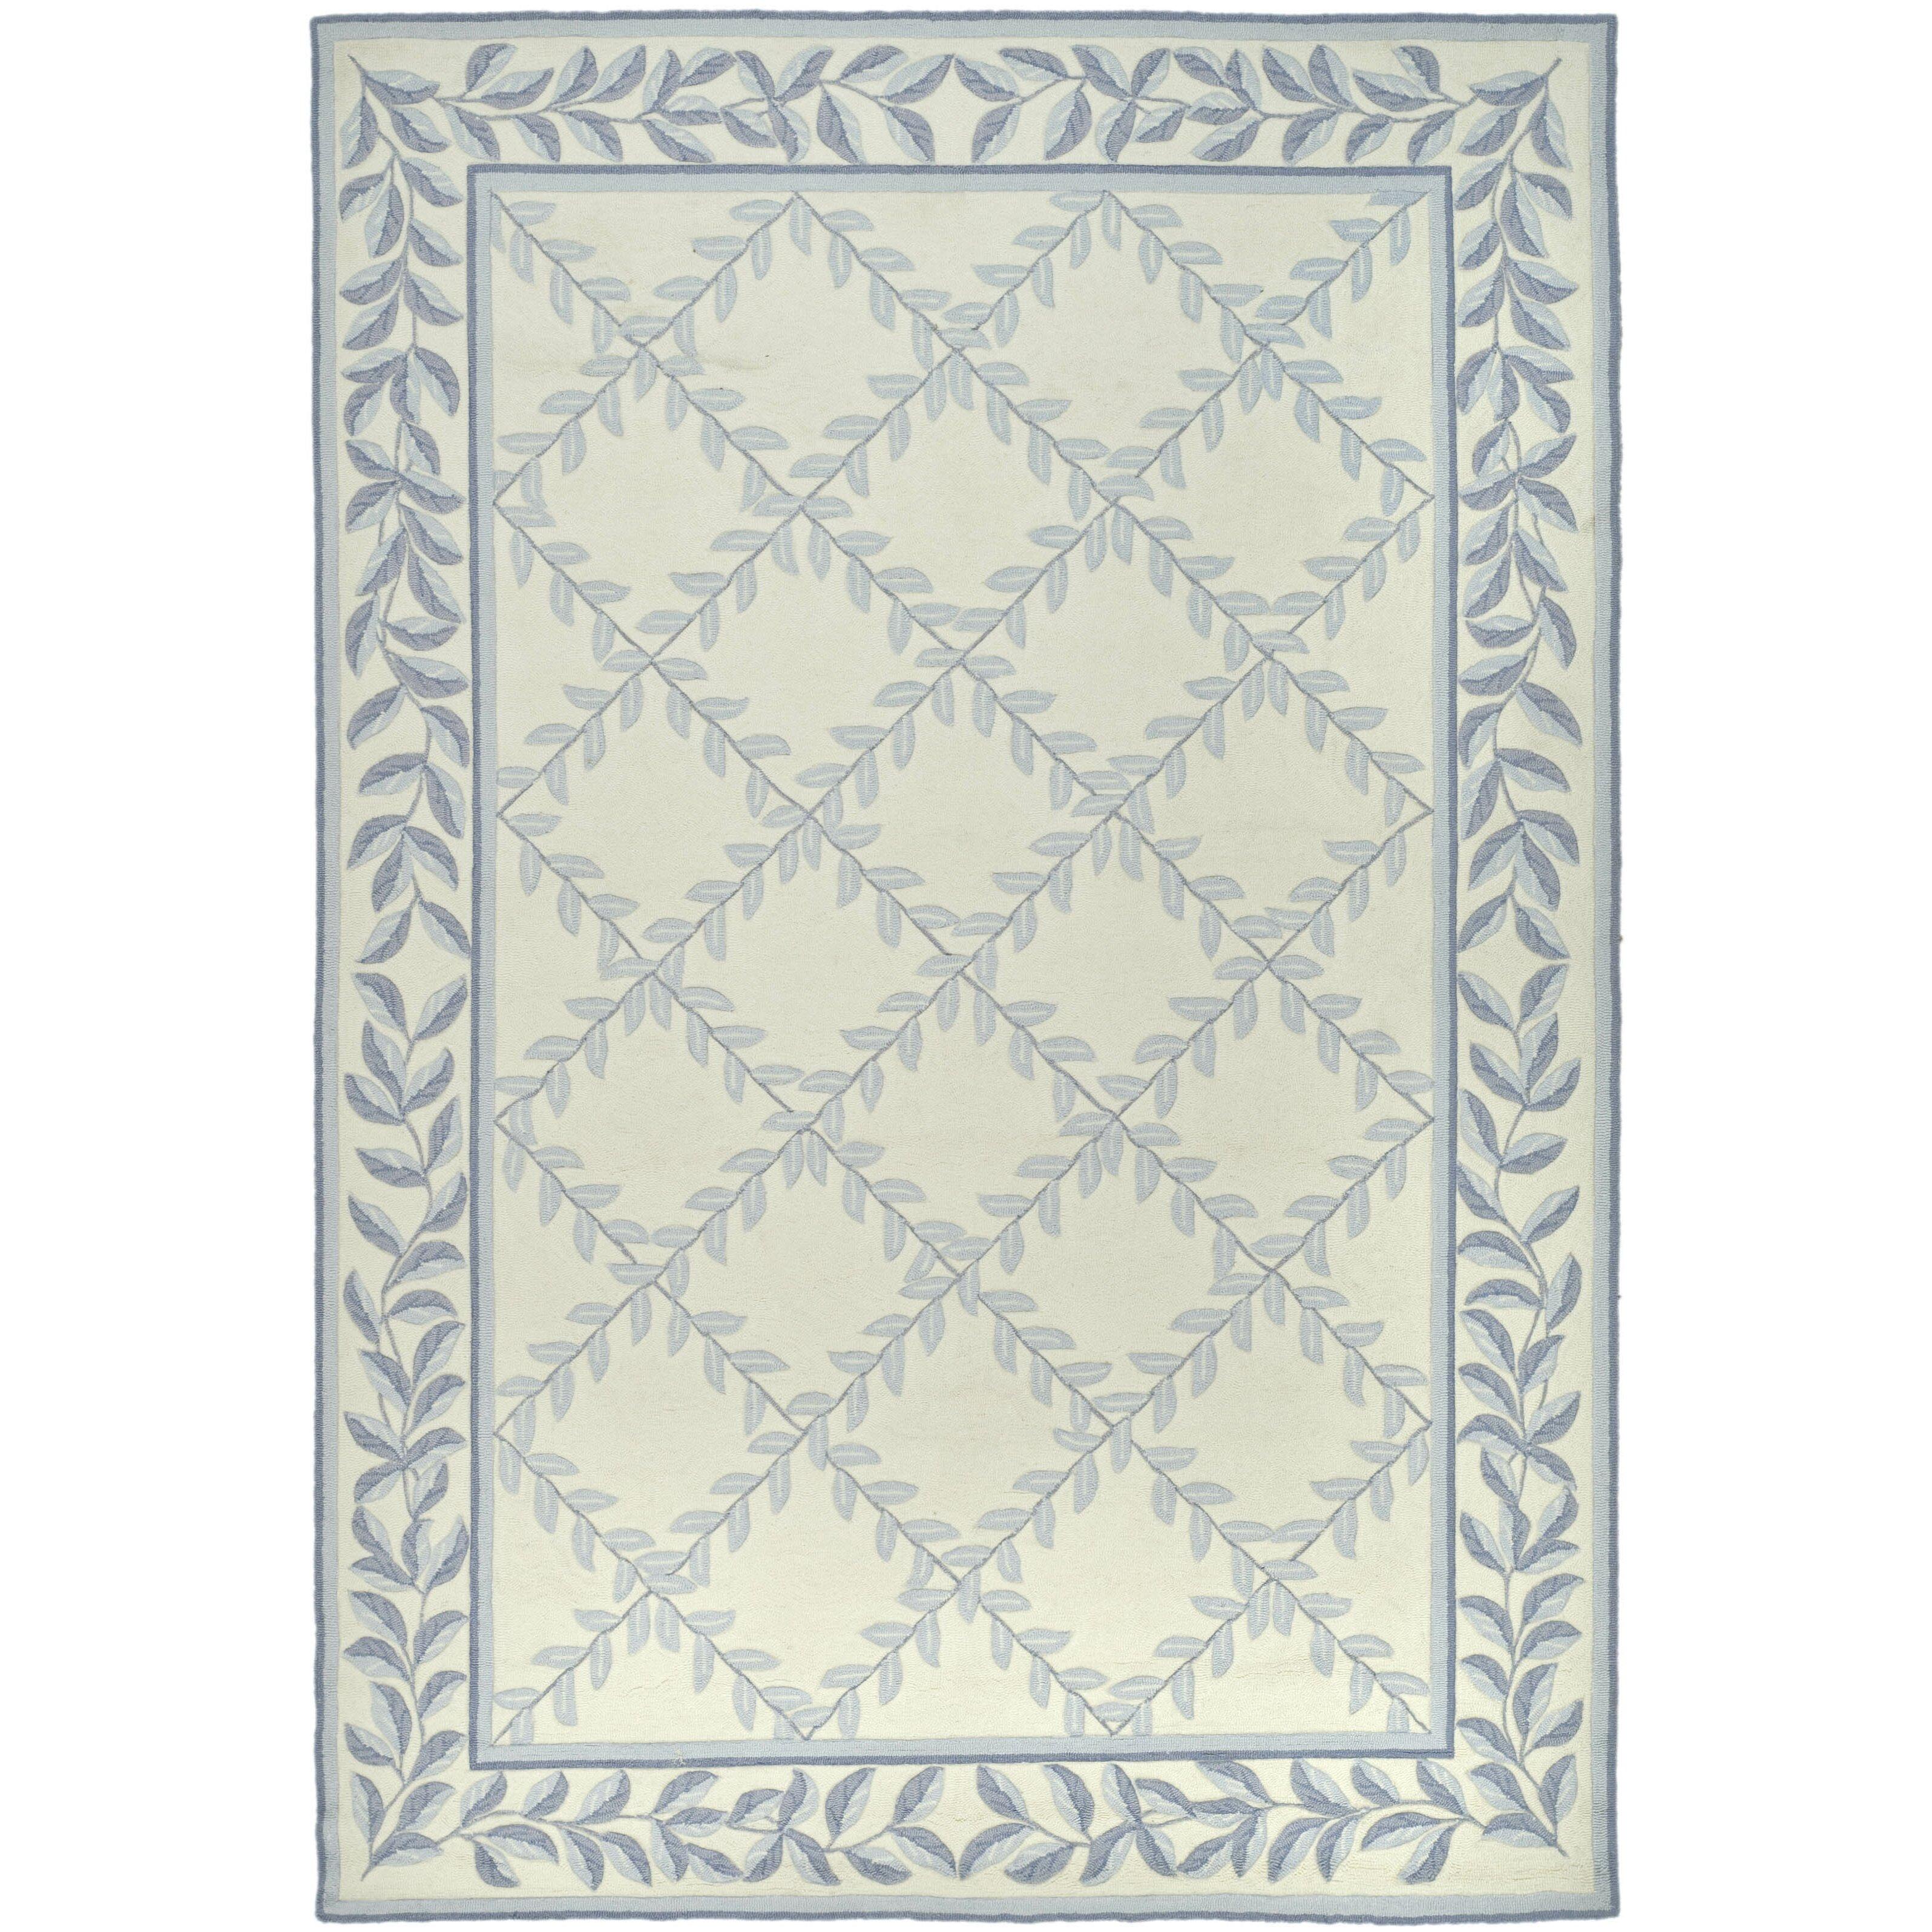 Safavieh durarug ivory light blue area rug reviews wayfair for Safavieh rugs